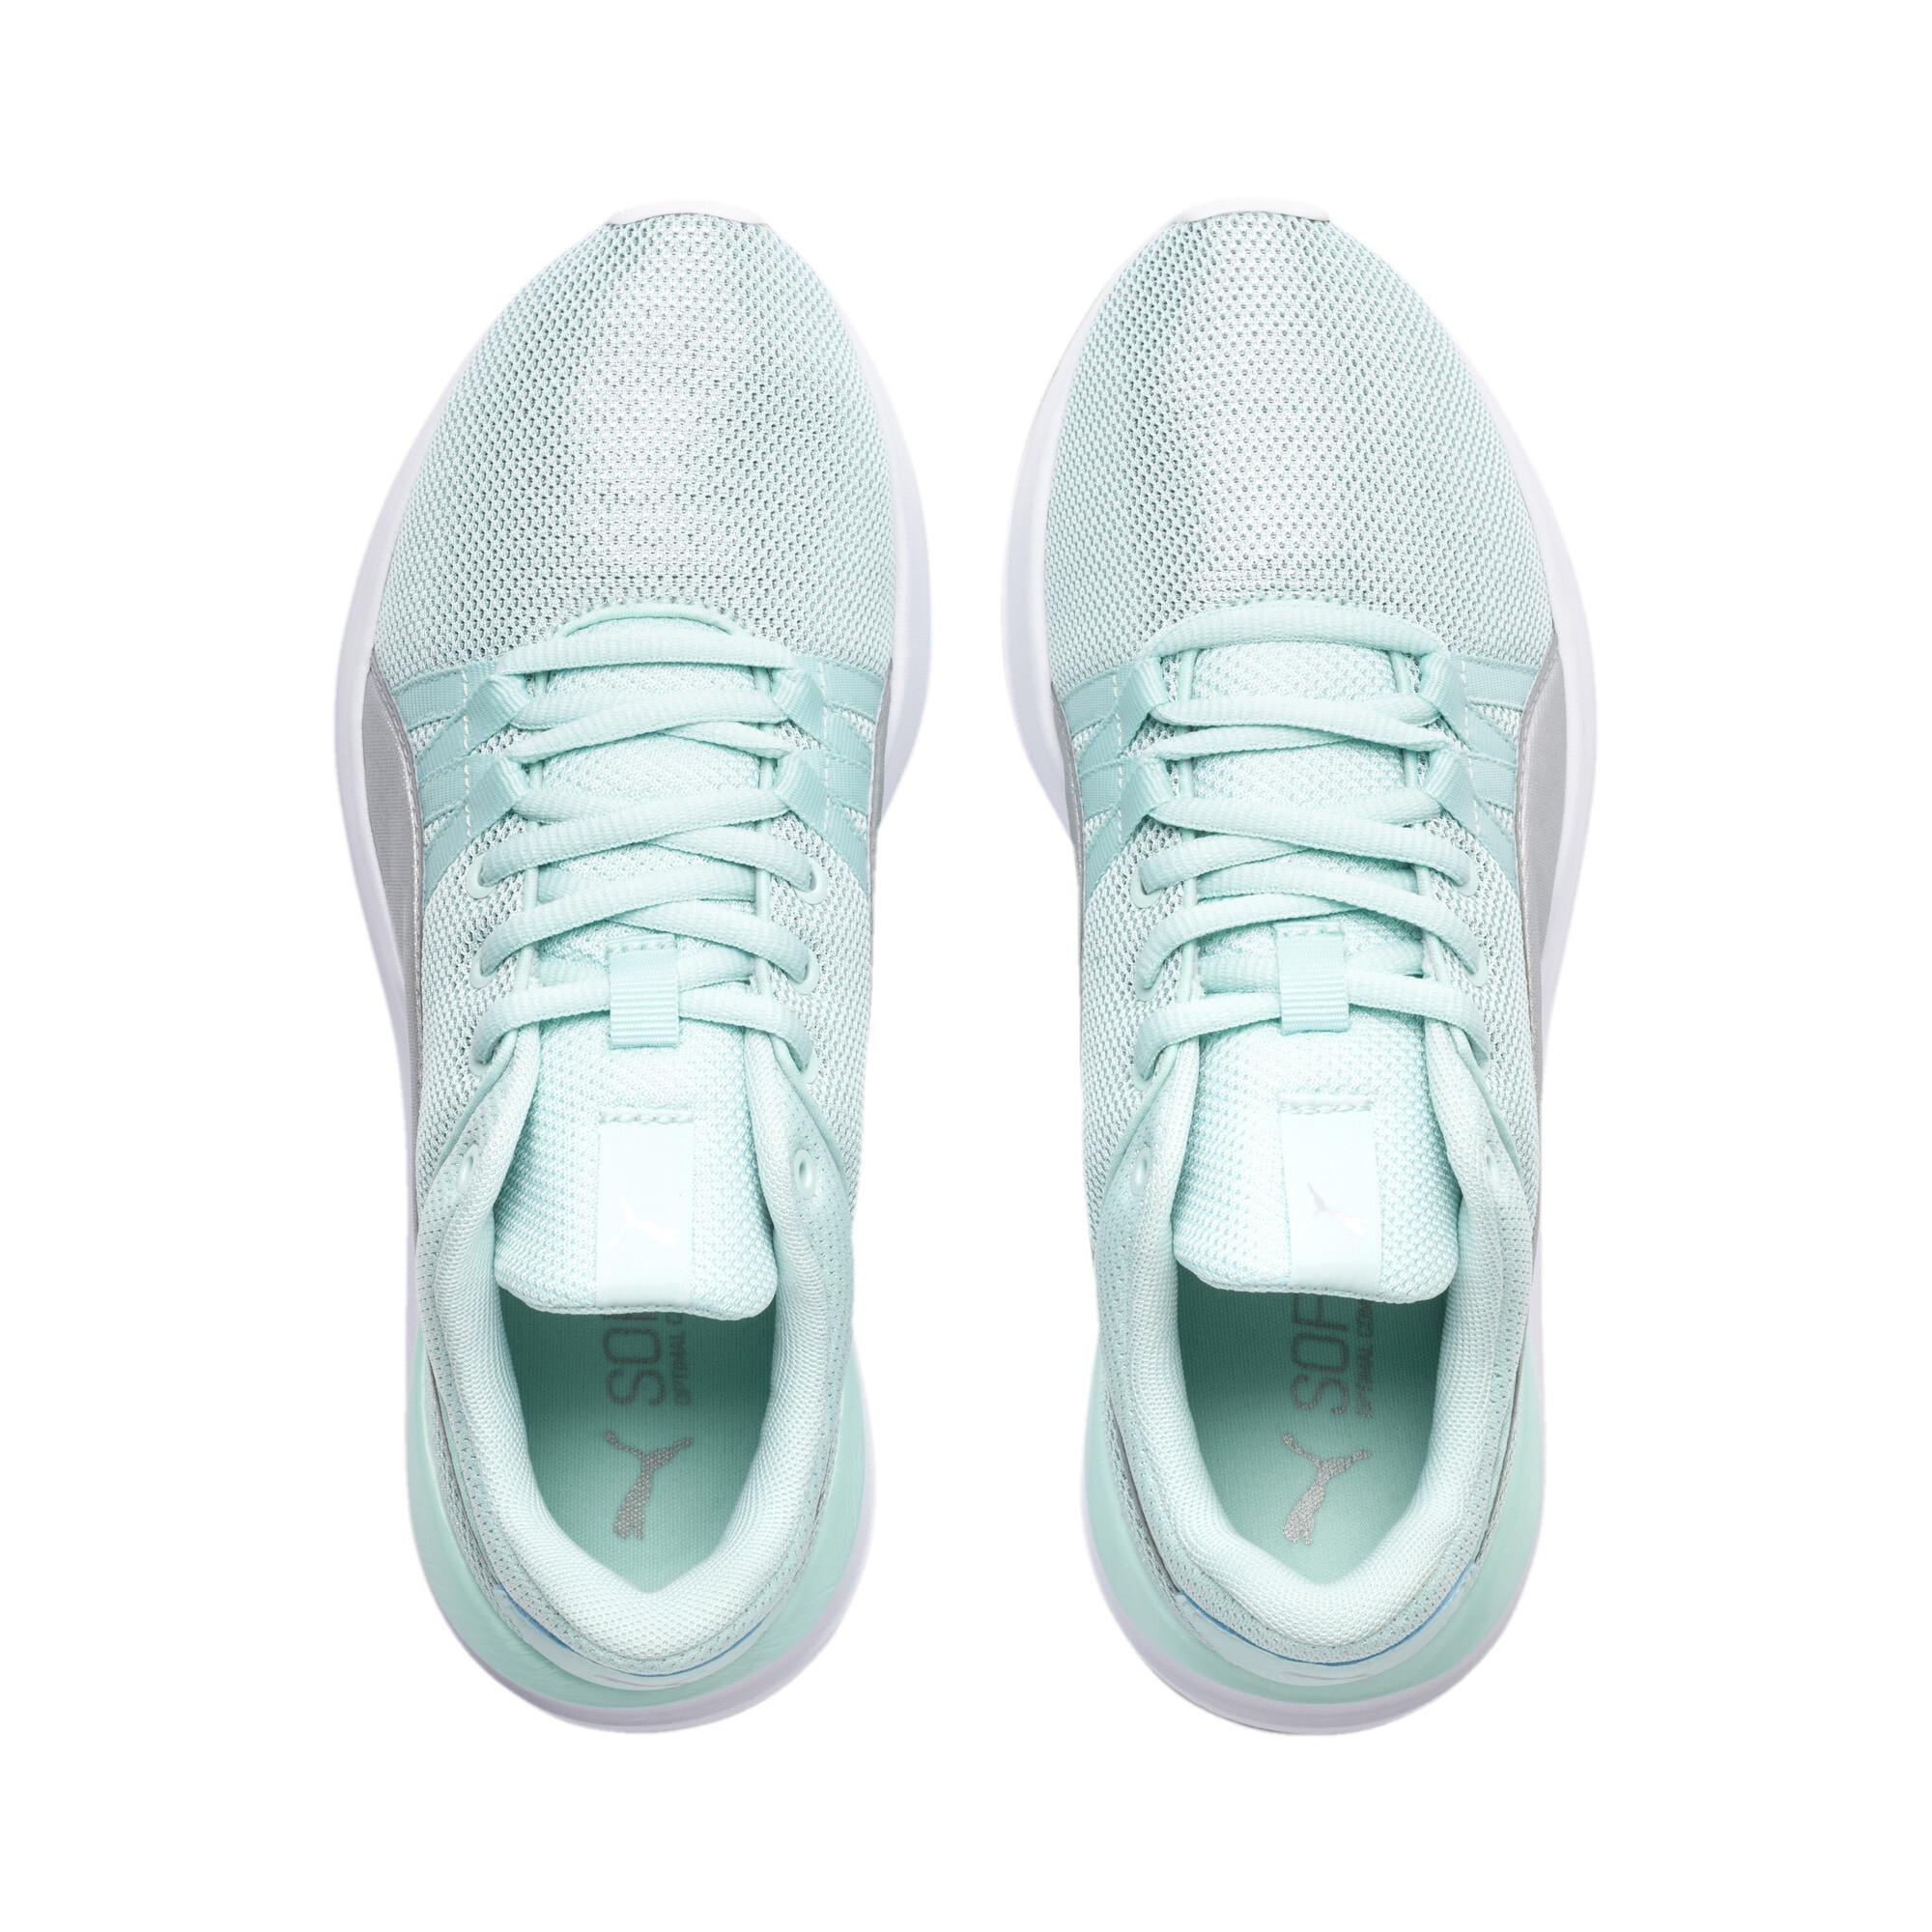 PUMA Adela Spark Girl's Sneakers JR Kids Shoe Kids